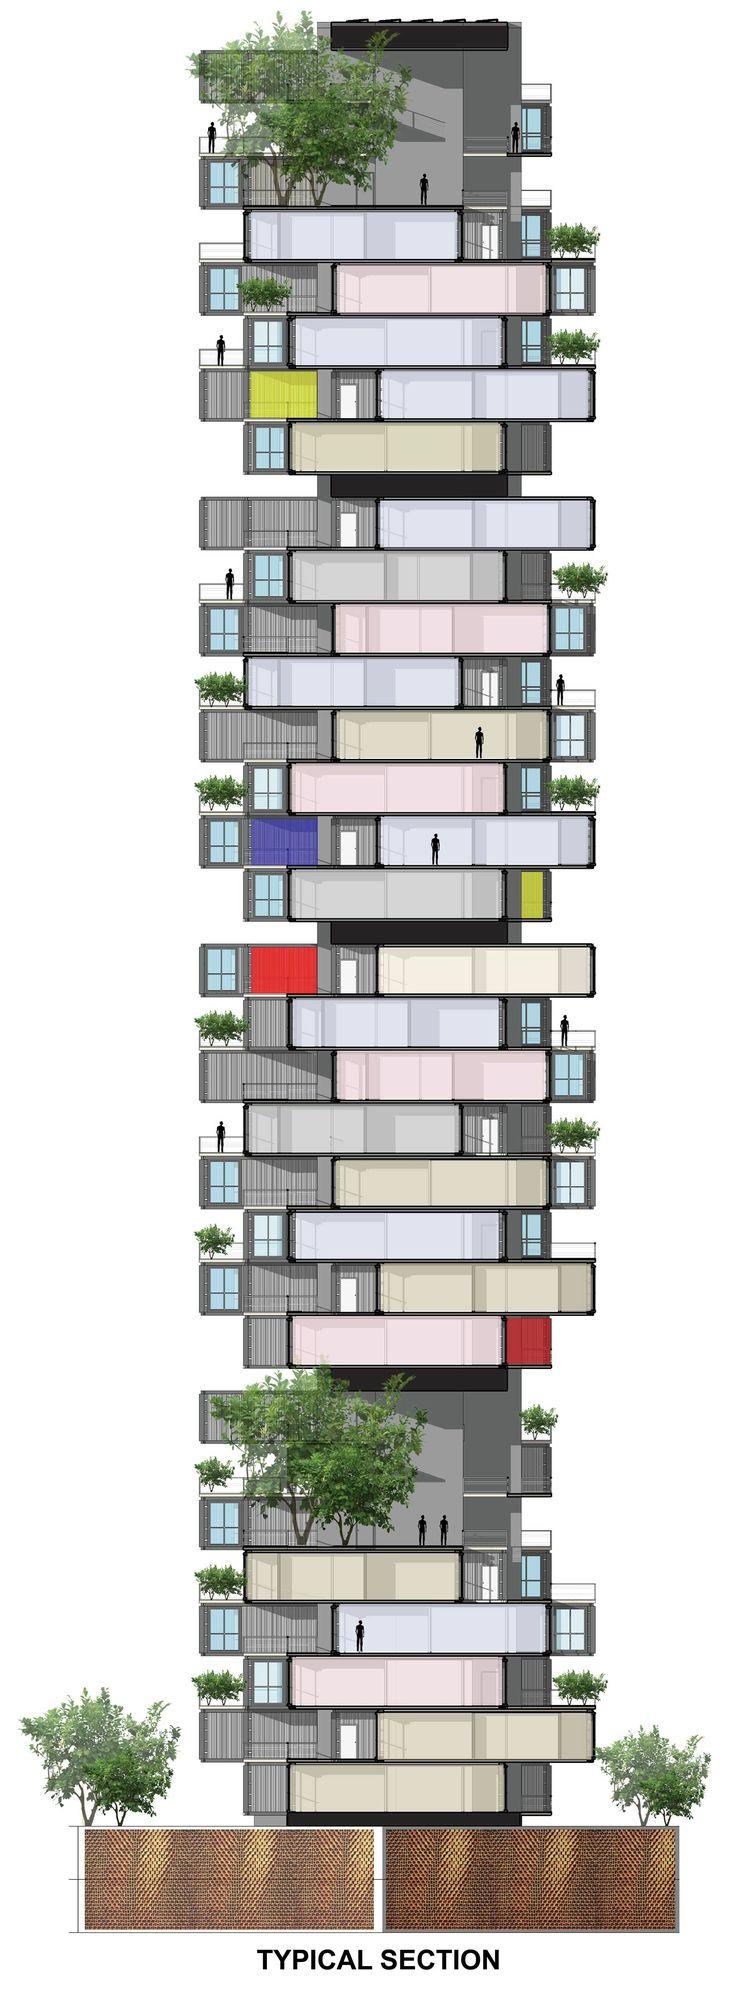 Shipping Containers As Housing Solution In Dharavi Slum   Ganti & Associates